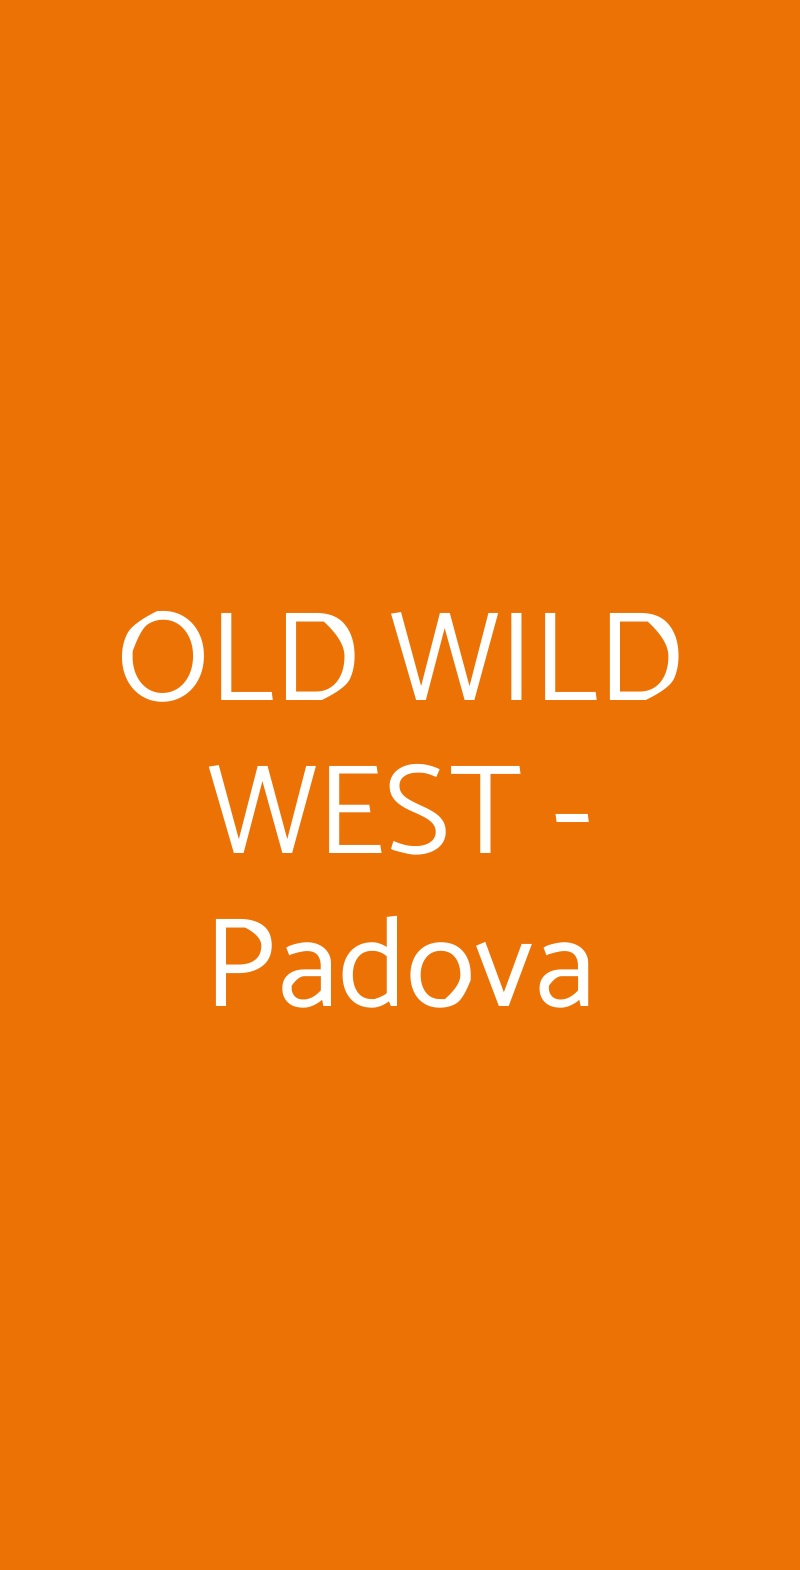 OLD WILD WEST - Padova Padova menù 1 pagina